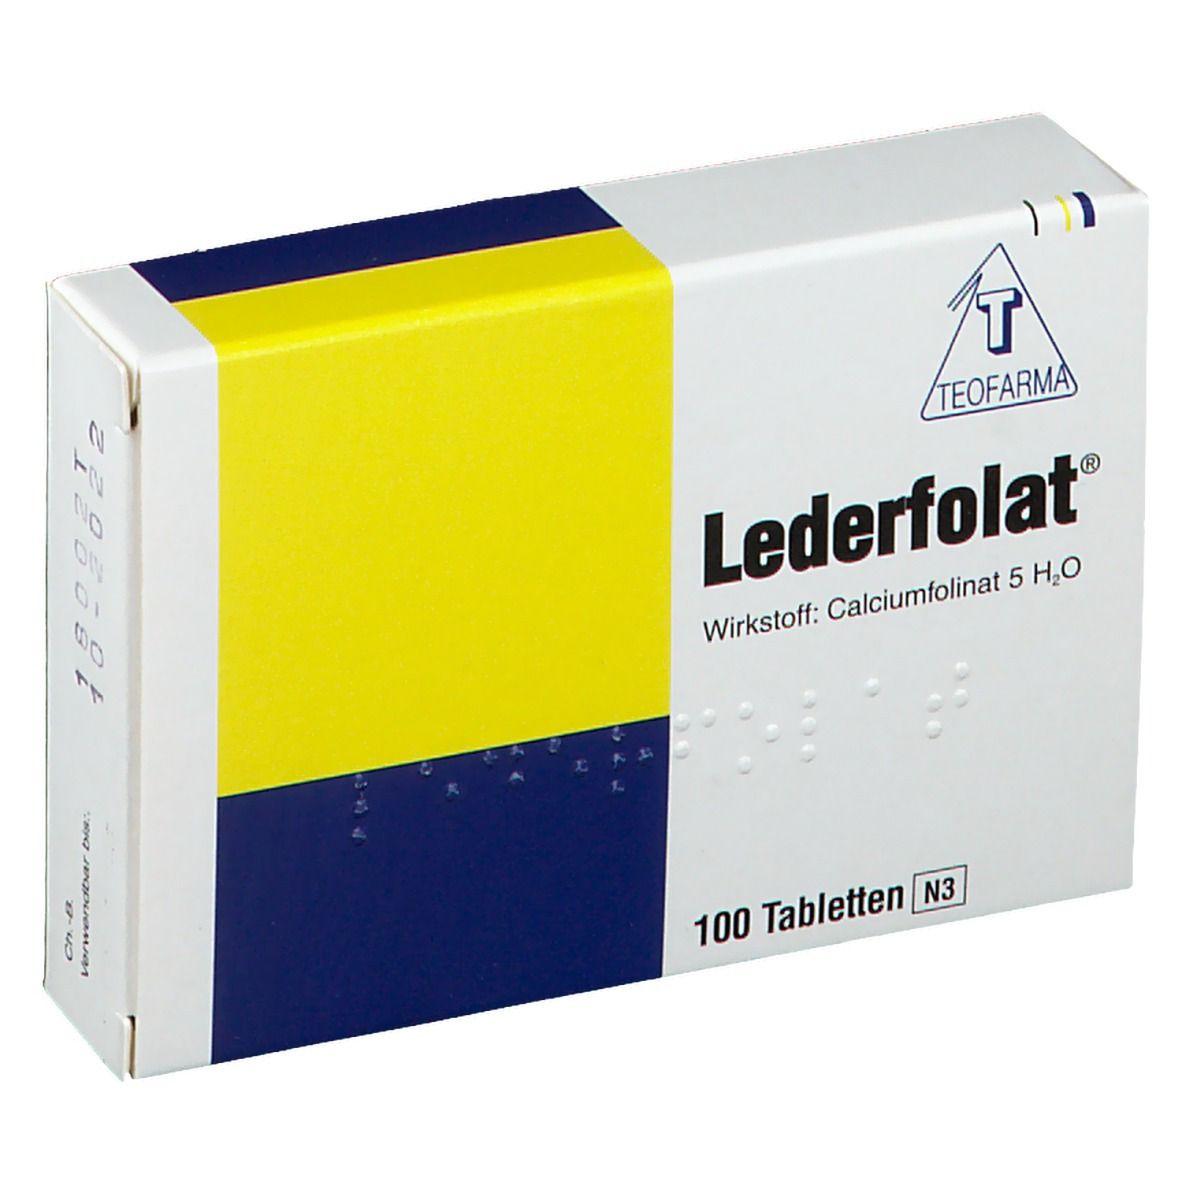 Lederfolat Tabletten